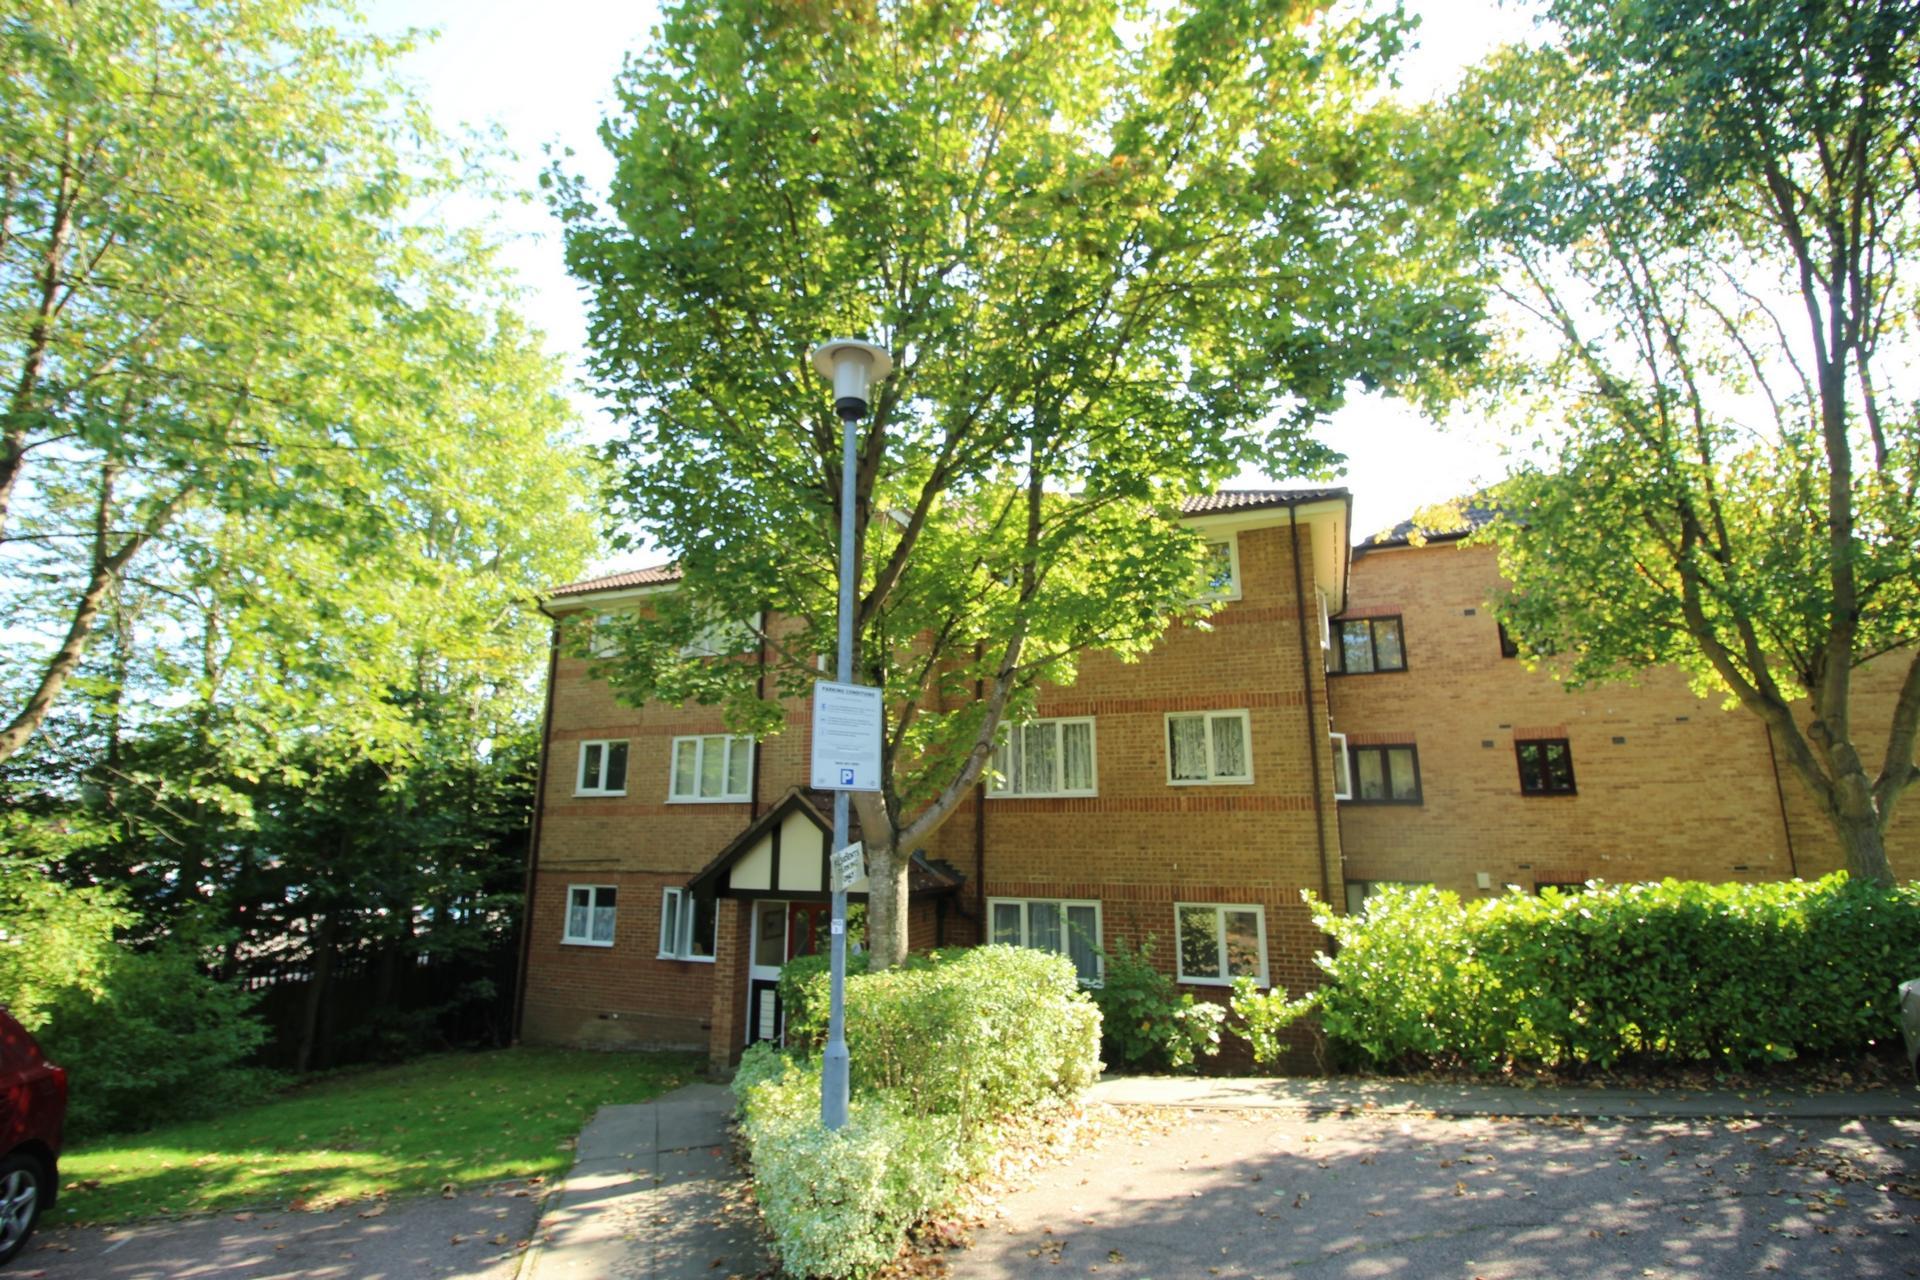 Woodland Grove  Epping  CM16